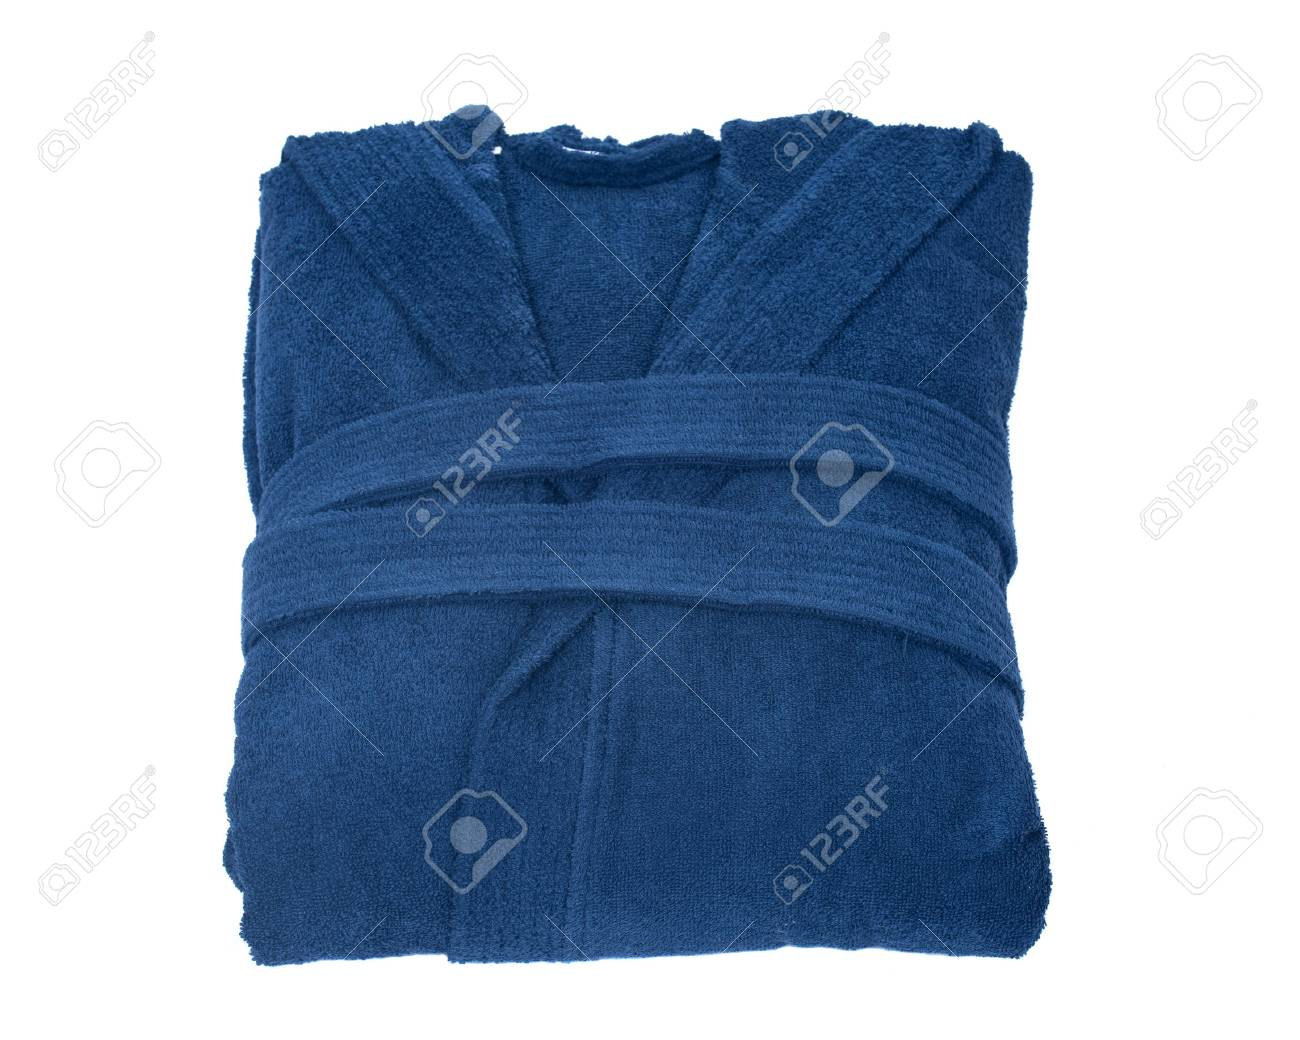 Blue cotton velour bathrobe isolated on white background - 65073120